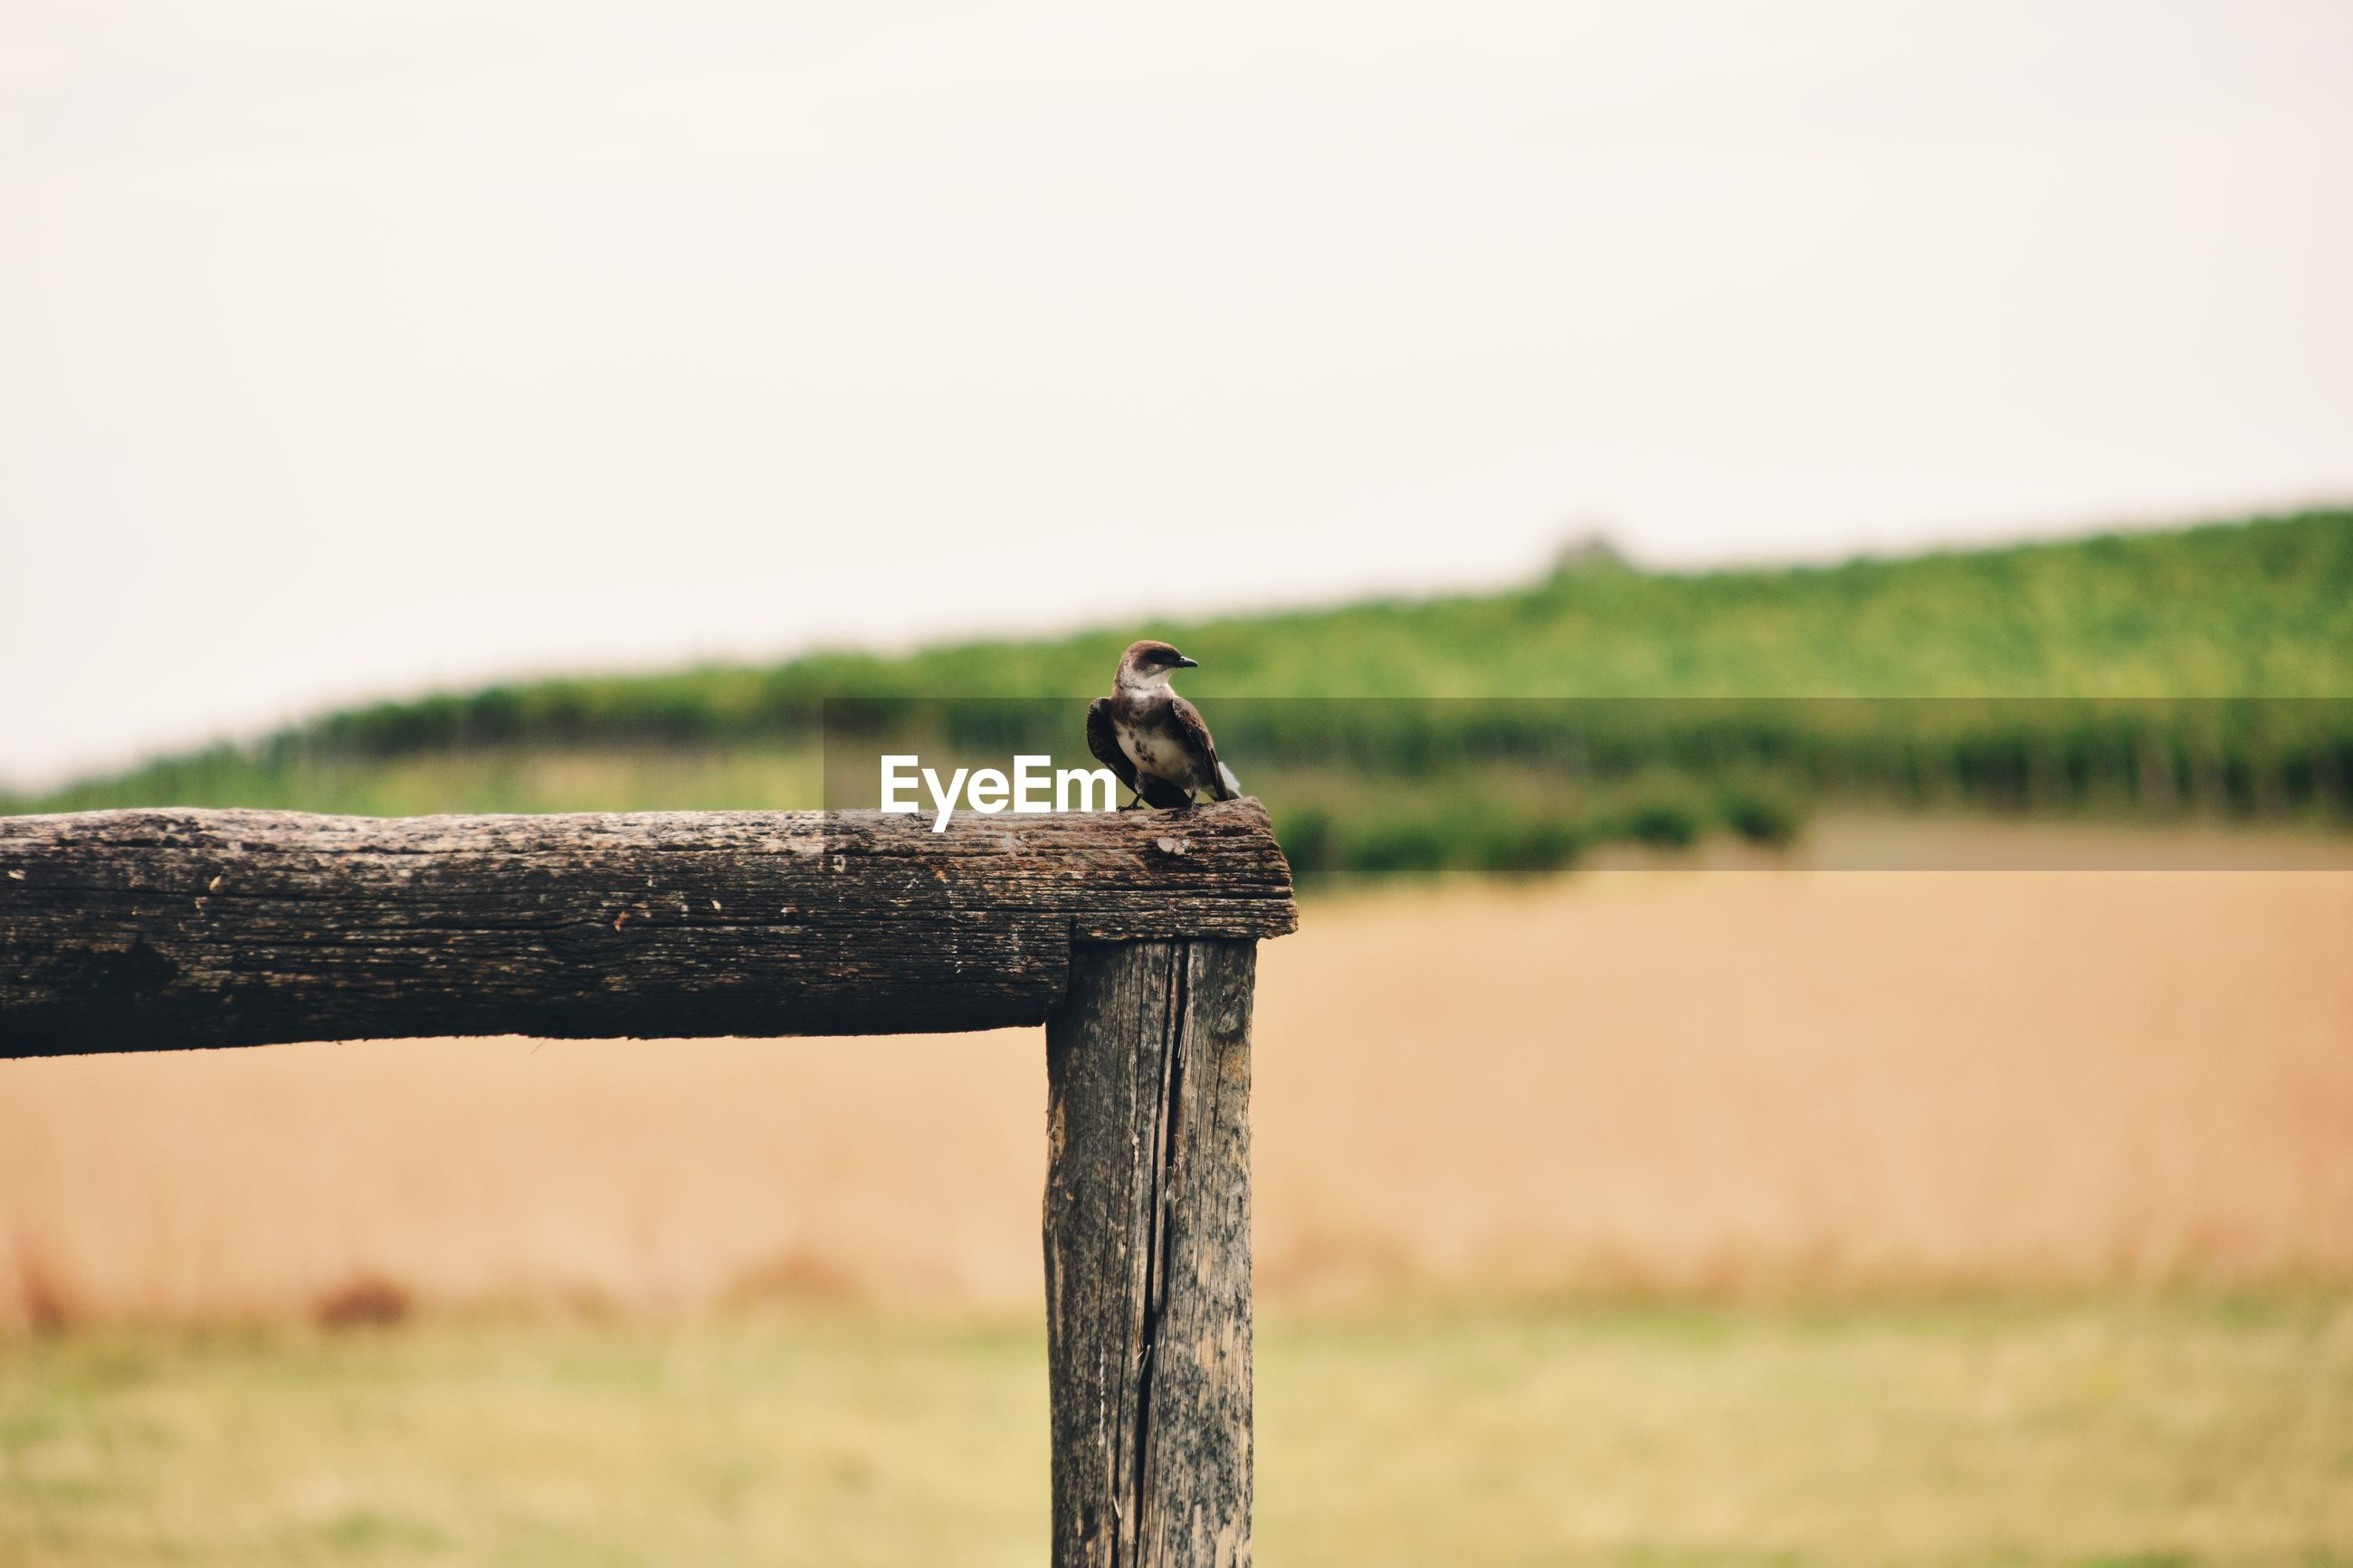 BIRDS PERCHING ON WOODEN POST